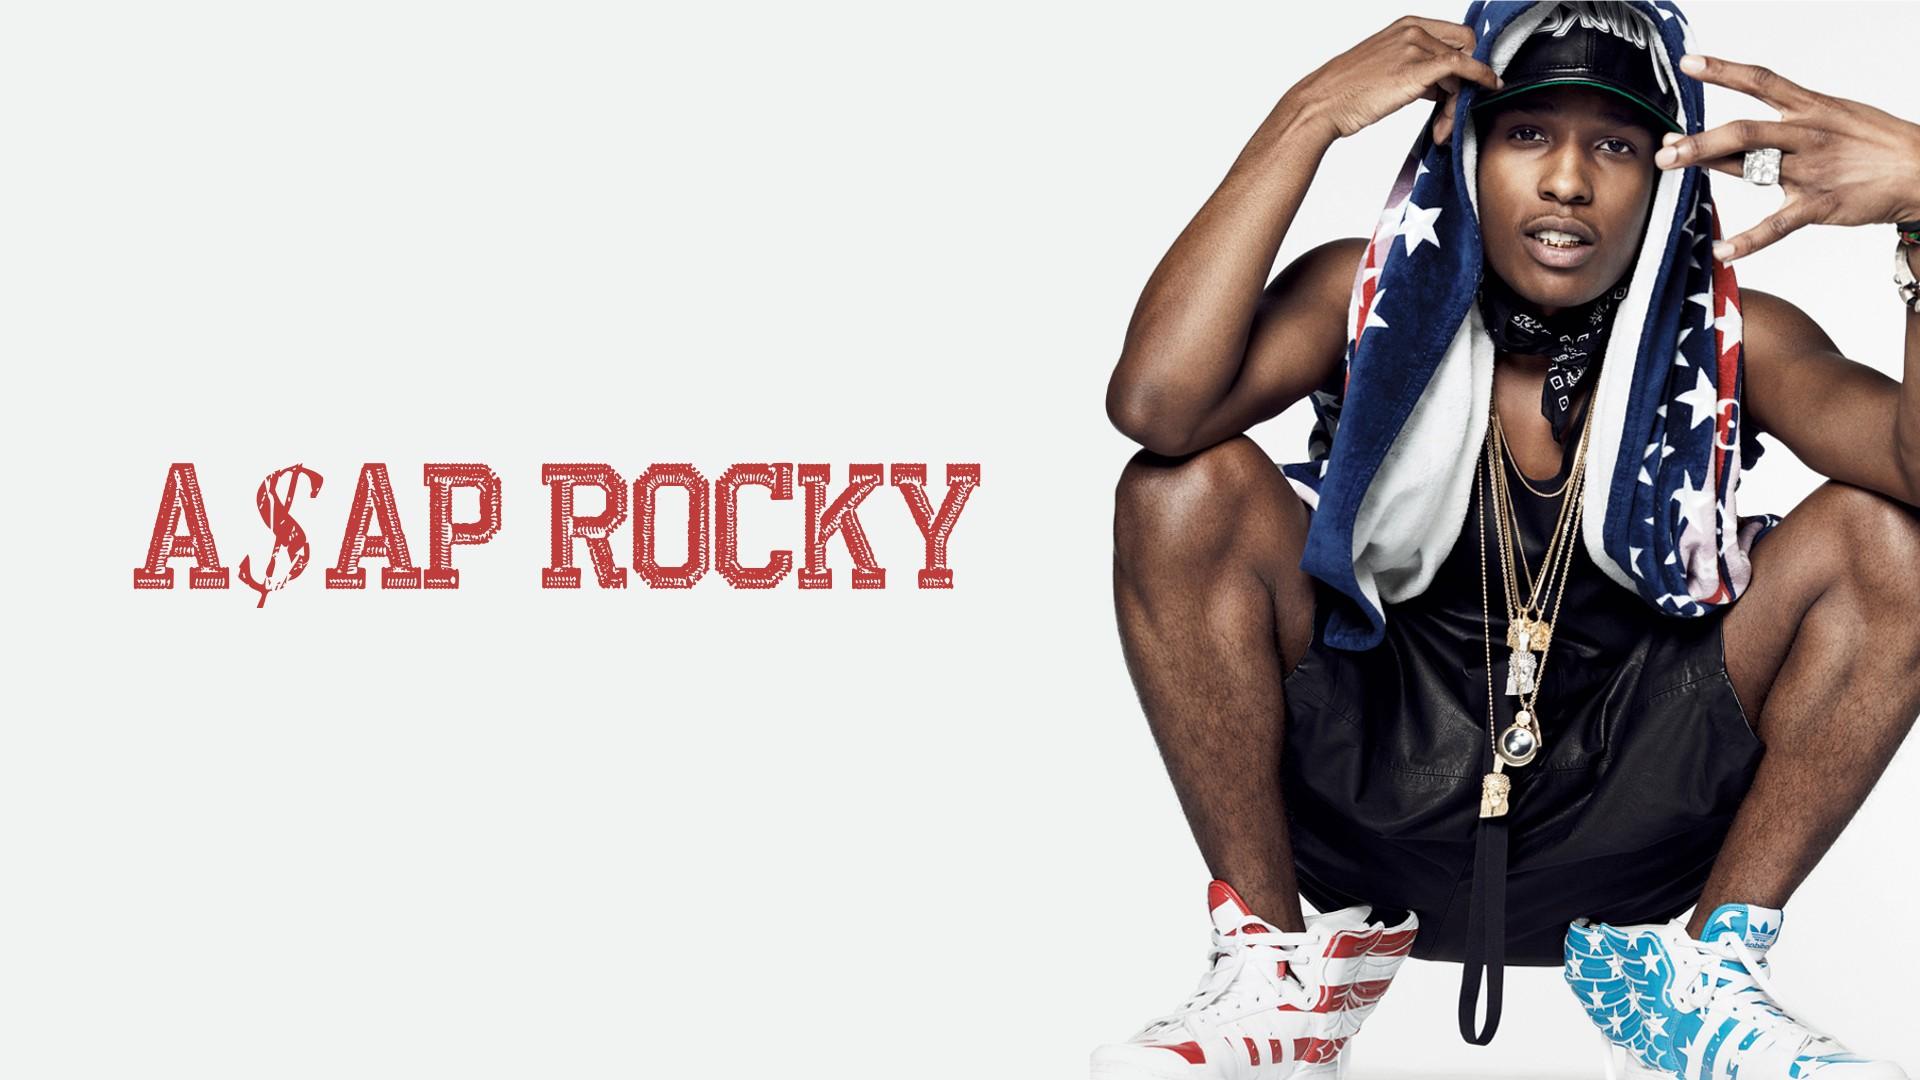 [47+] ASAP Rocky Wallpaper HD on WallpaperSafari